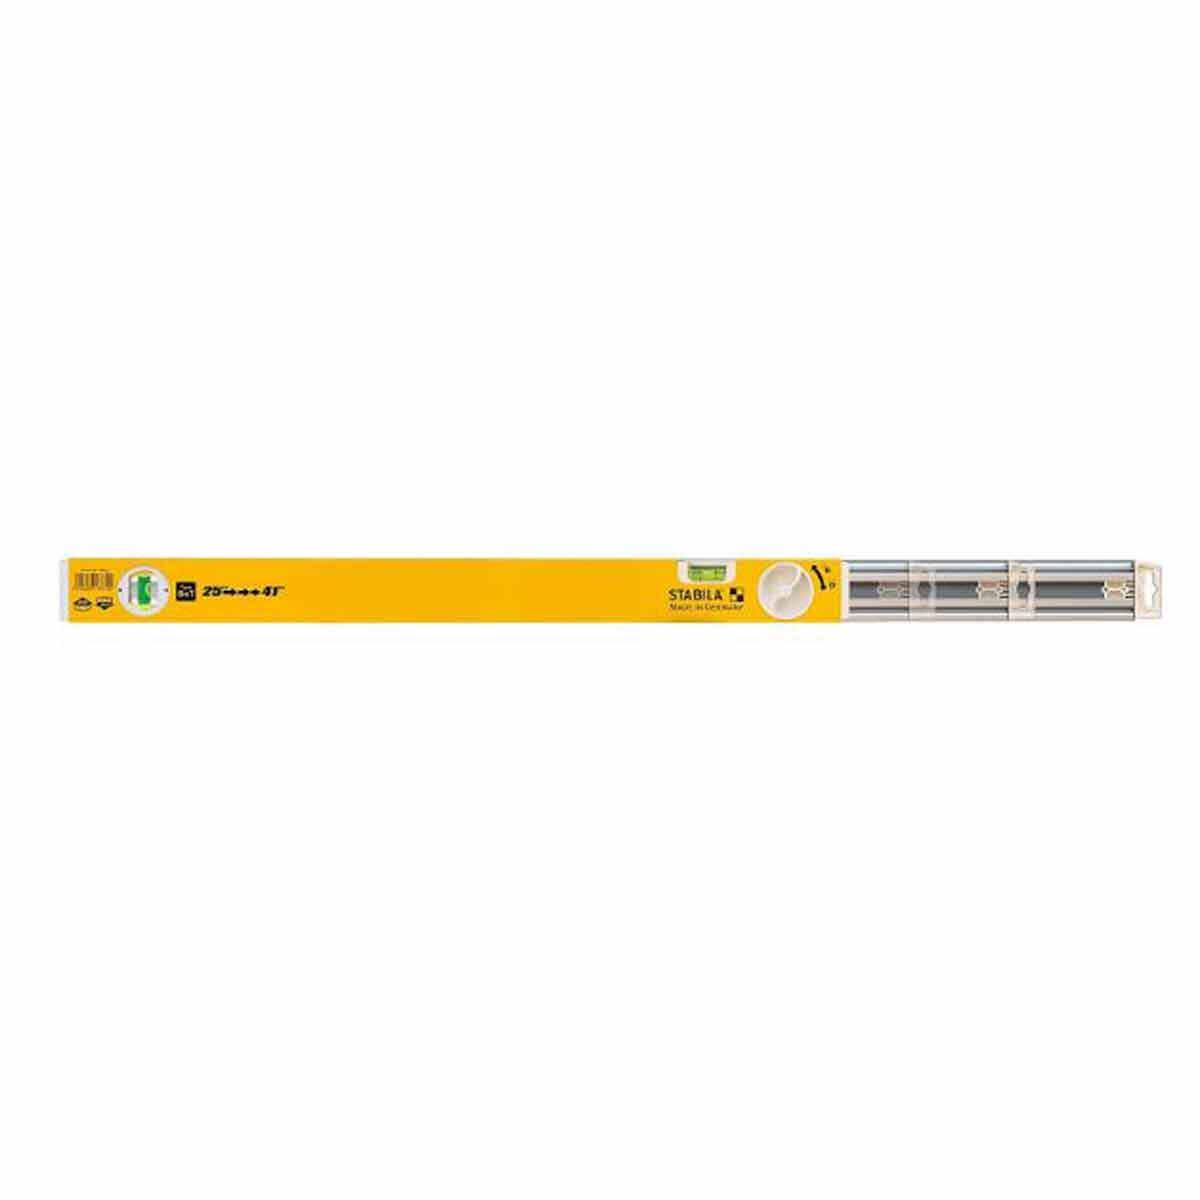 Stabila 80T Adjustable Length Level